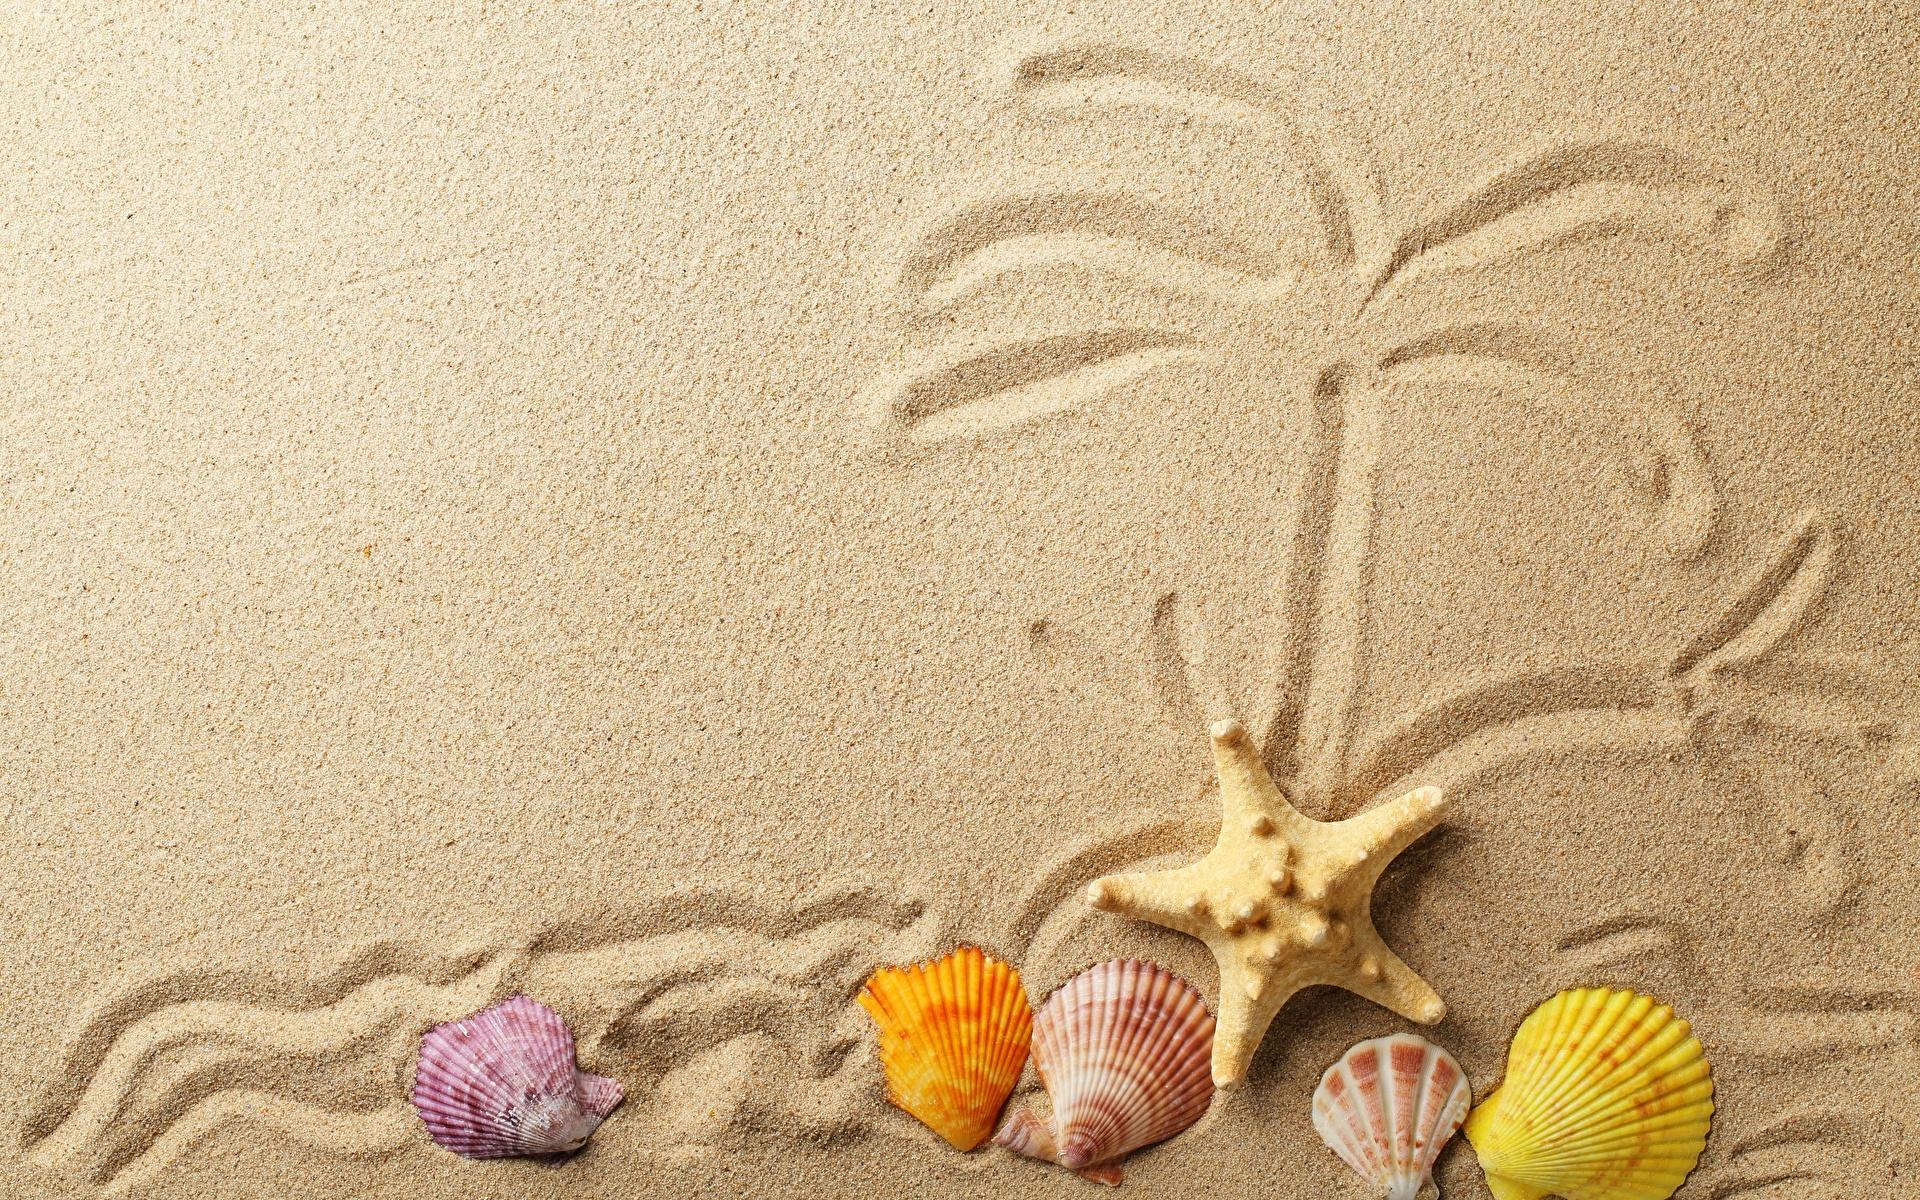 Картинки Морские звезды песка Ракушки 1920x1200 Песок песке